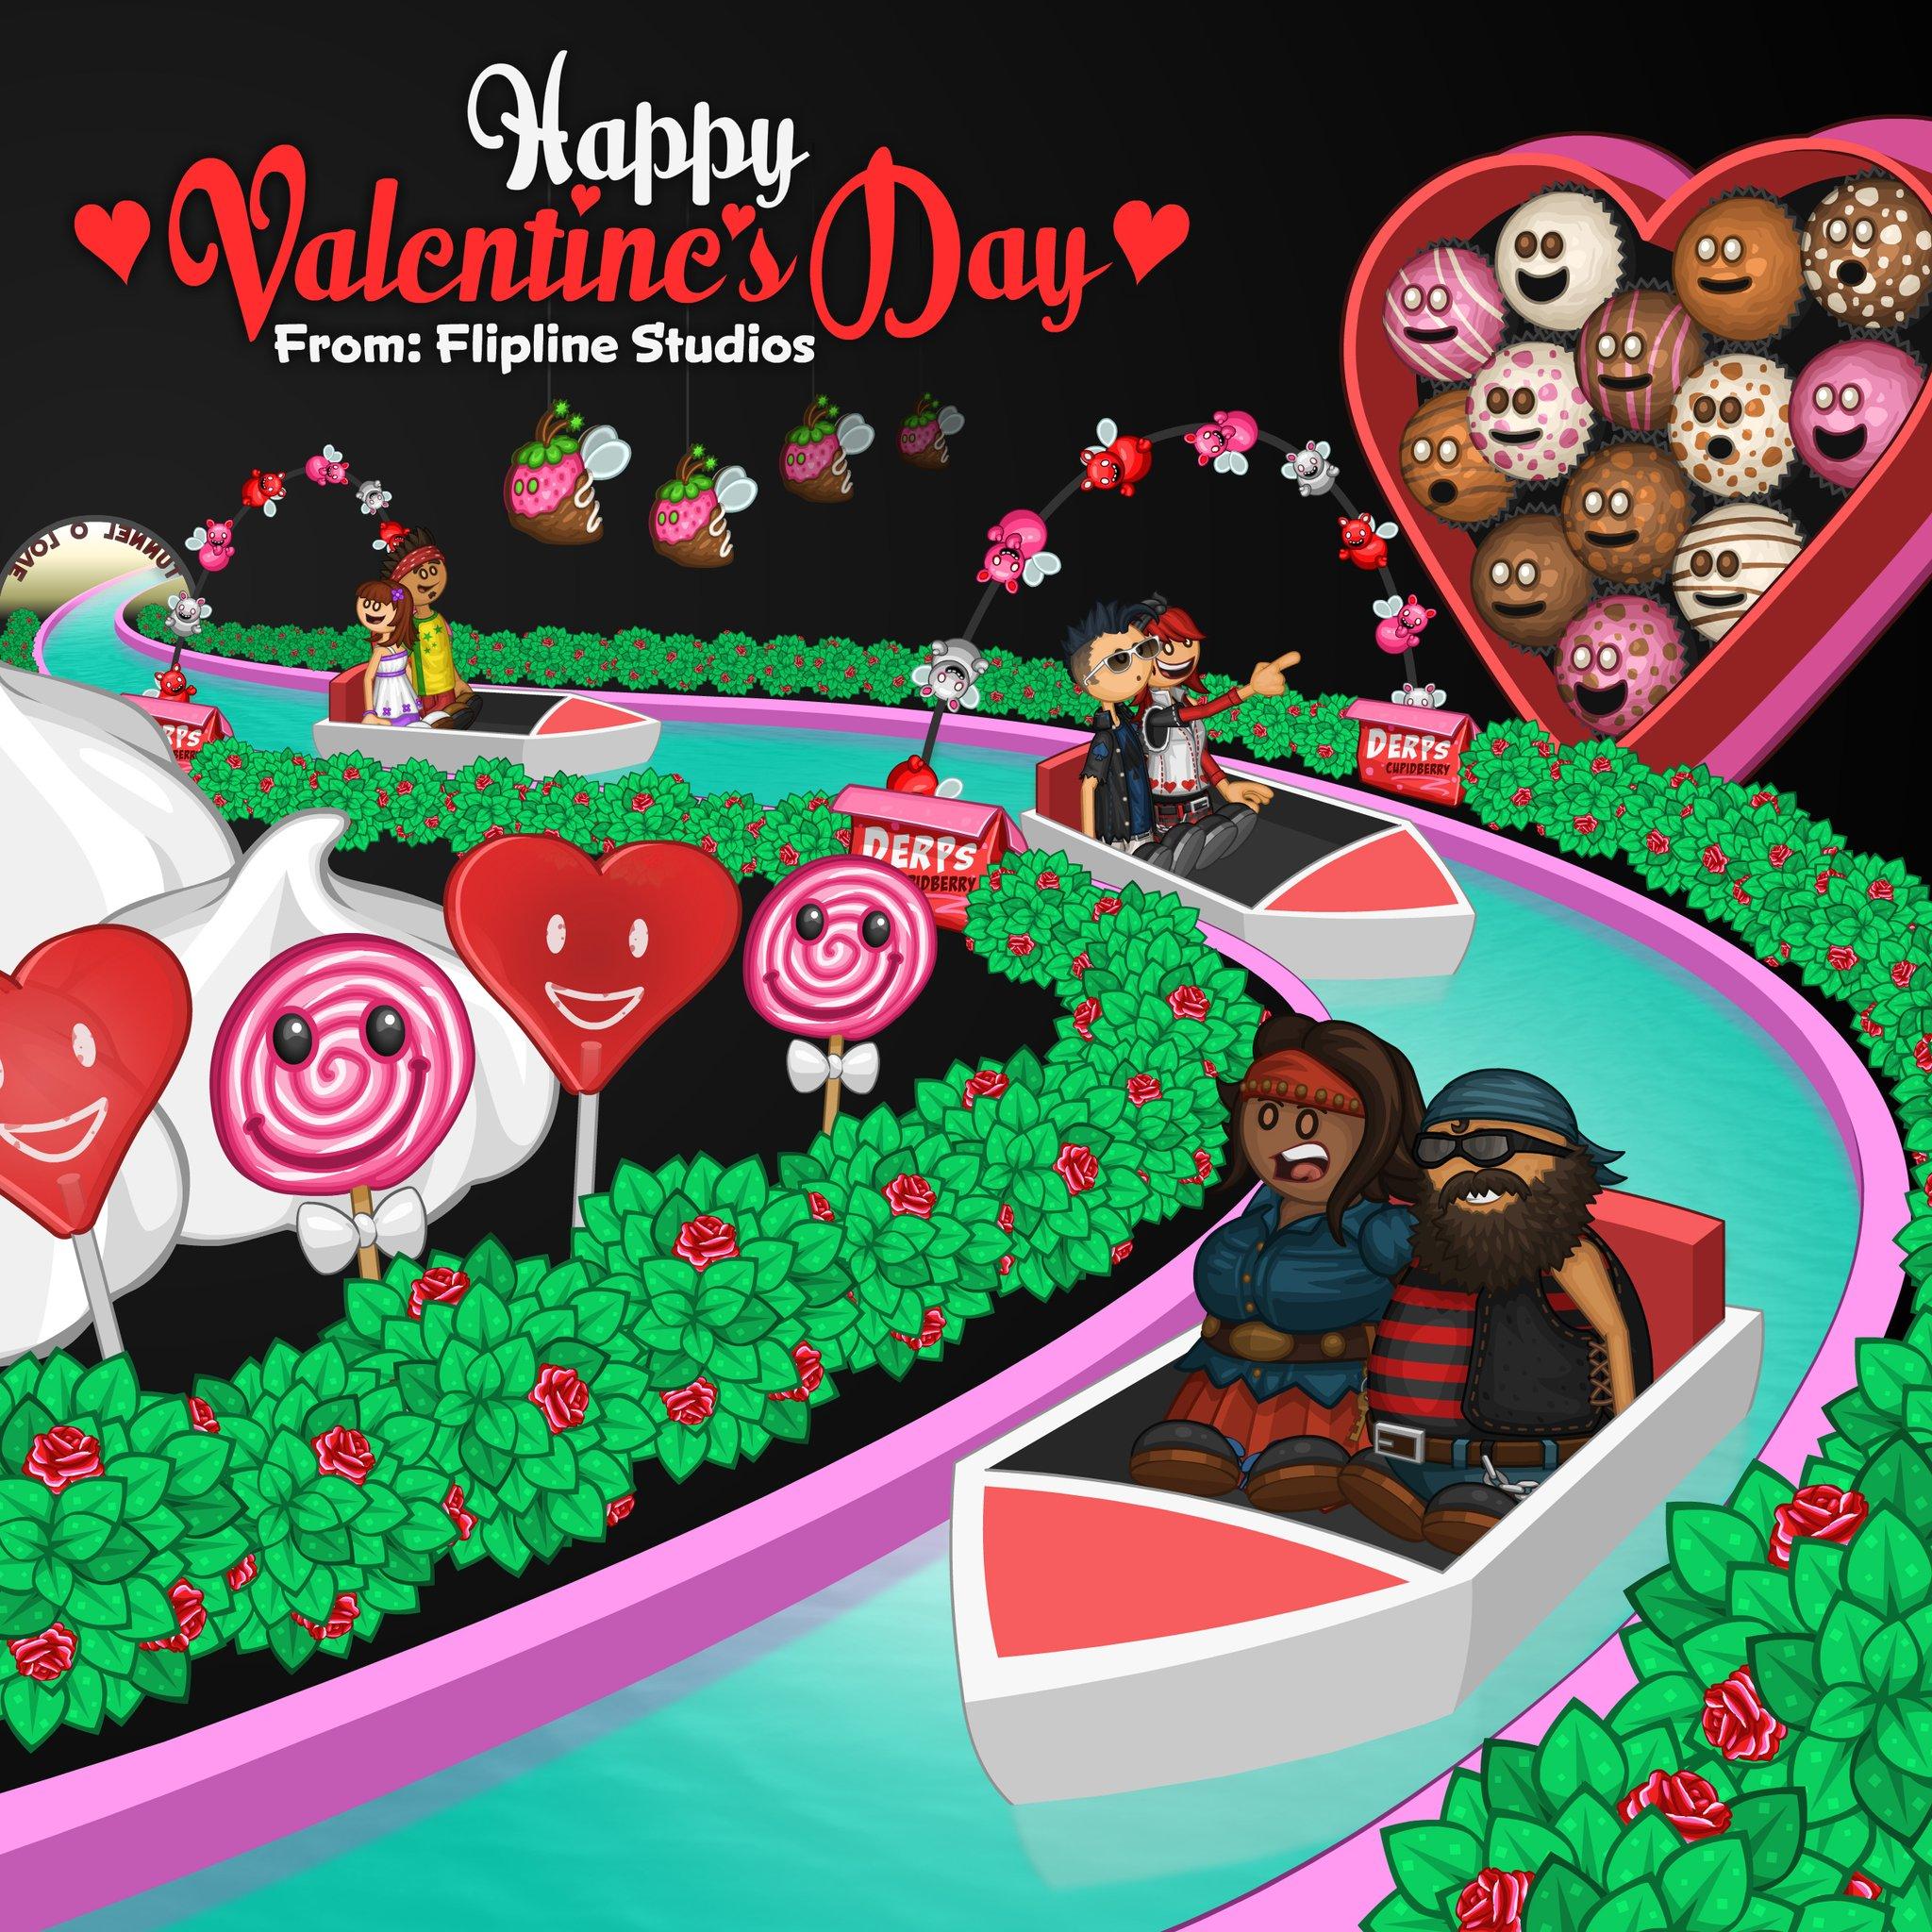 Flipline Studios On Twitter Happy Valentine S Day From Flipline